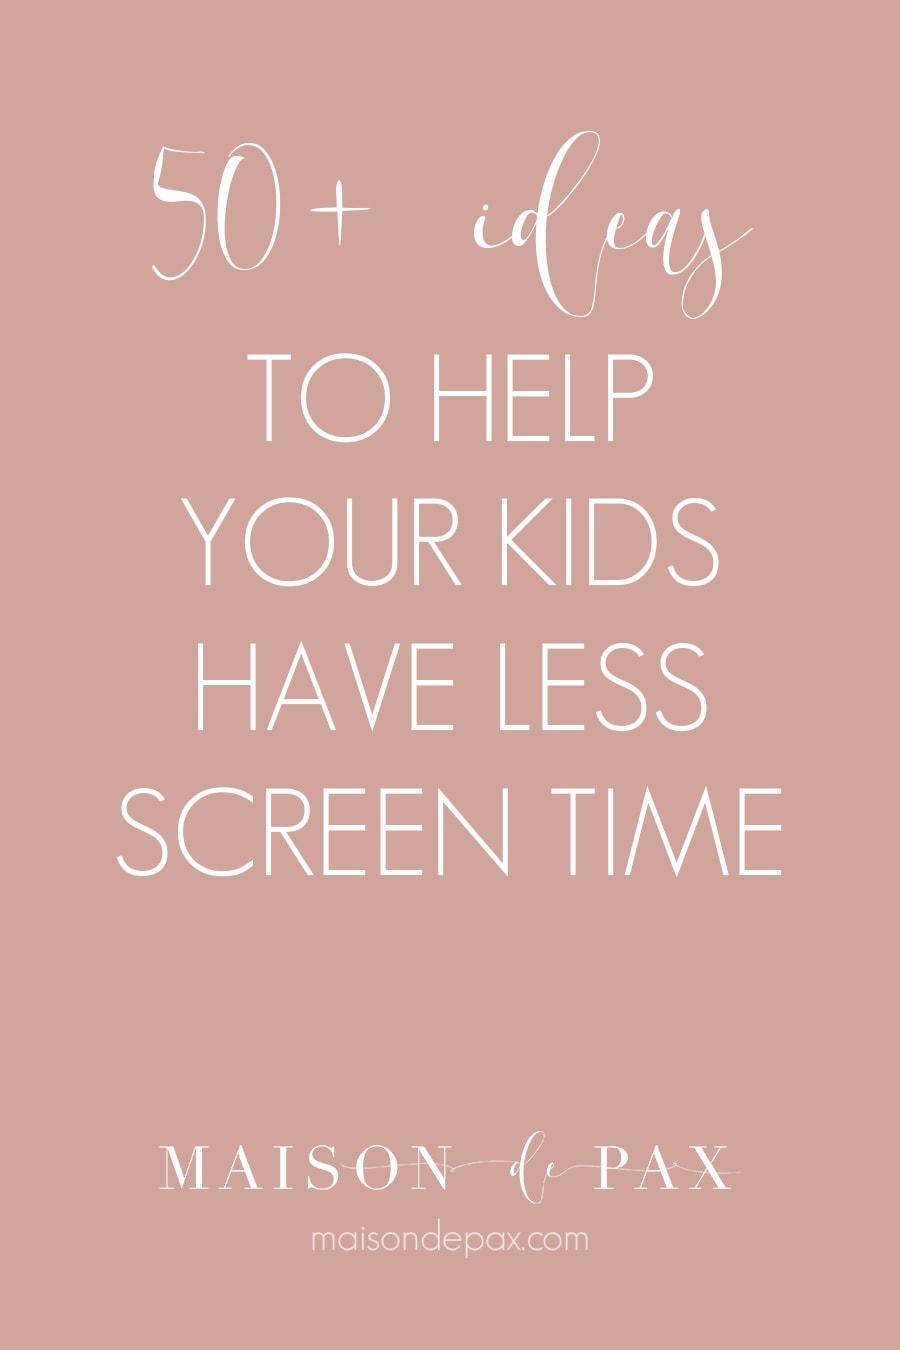 50+ ideas to hep your kids have less screen time | Maison de Pax